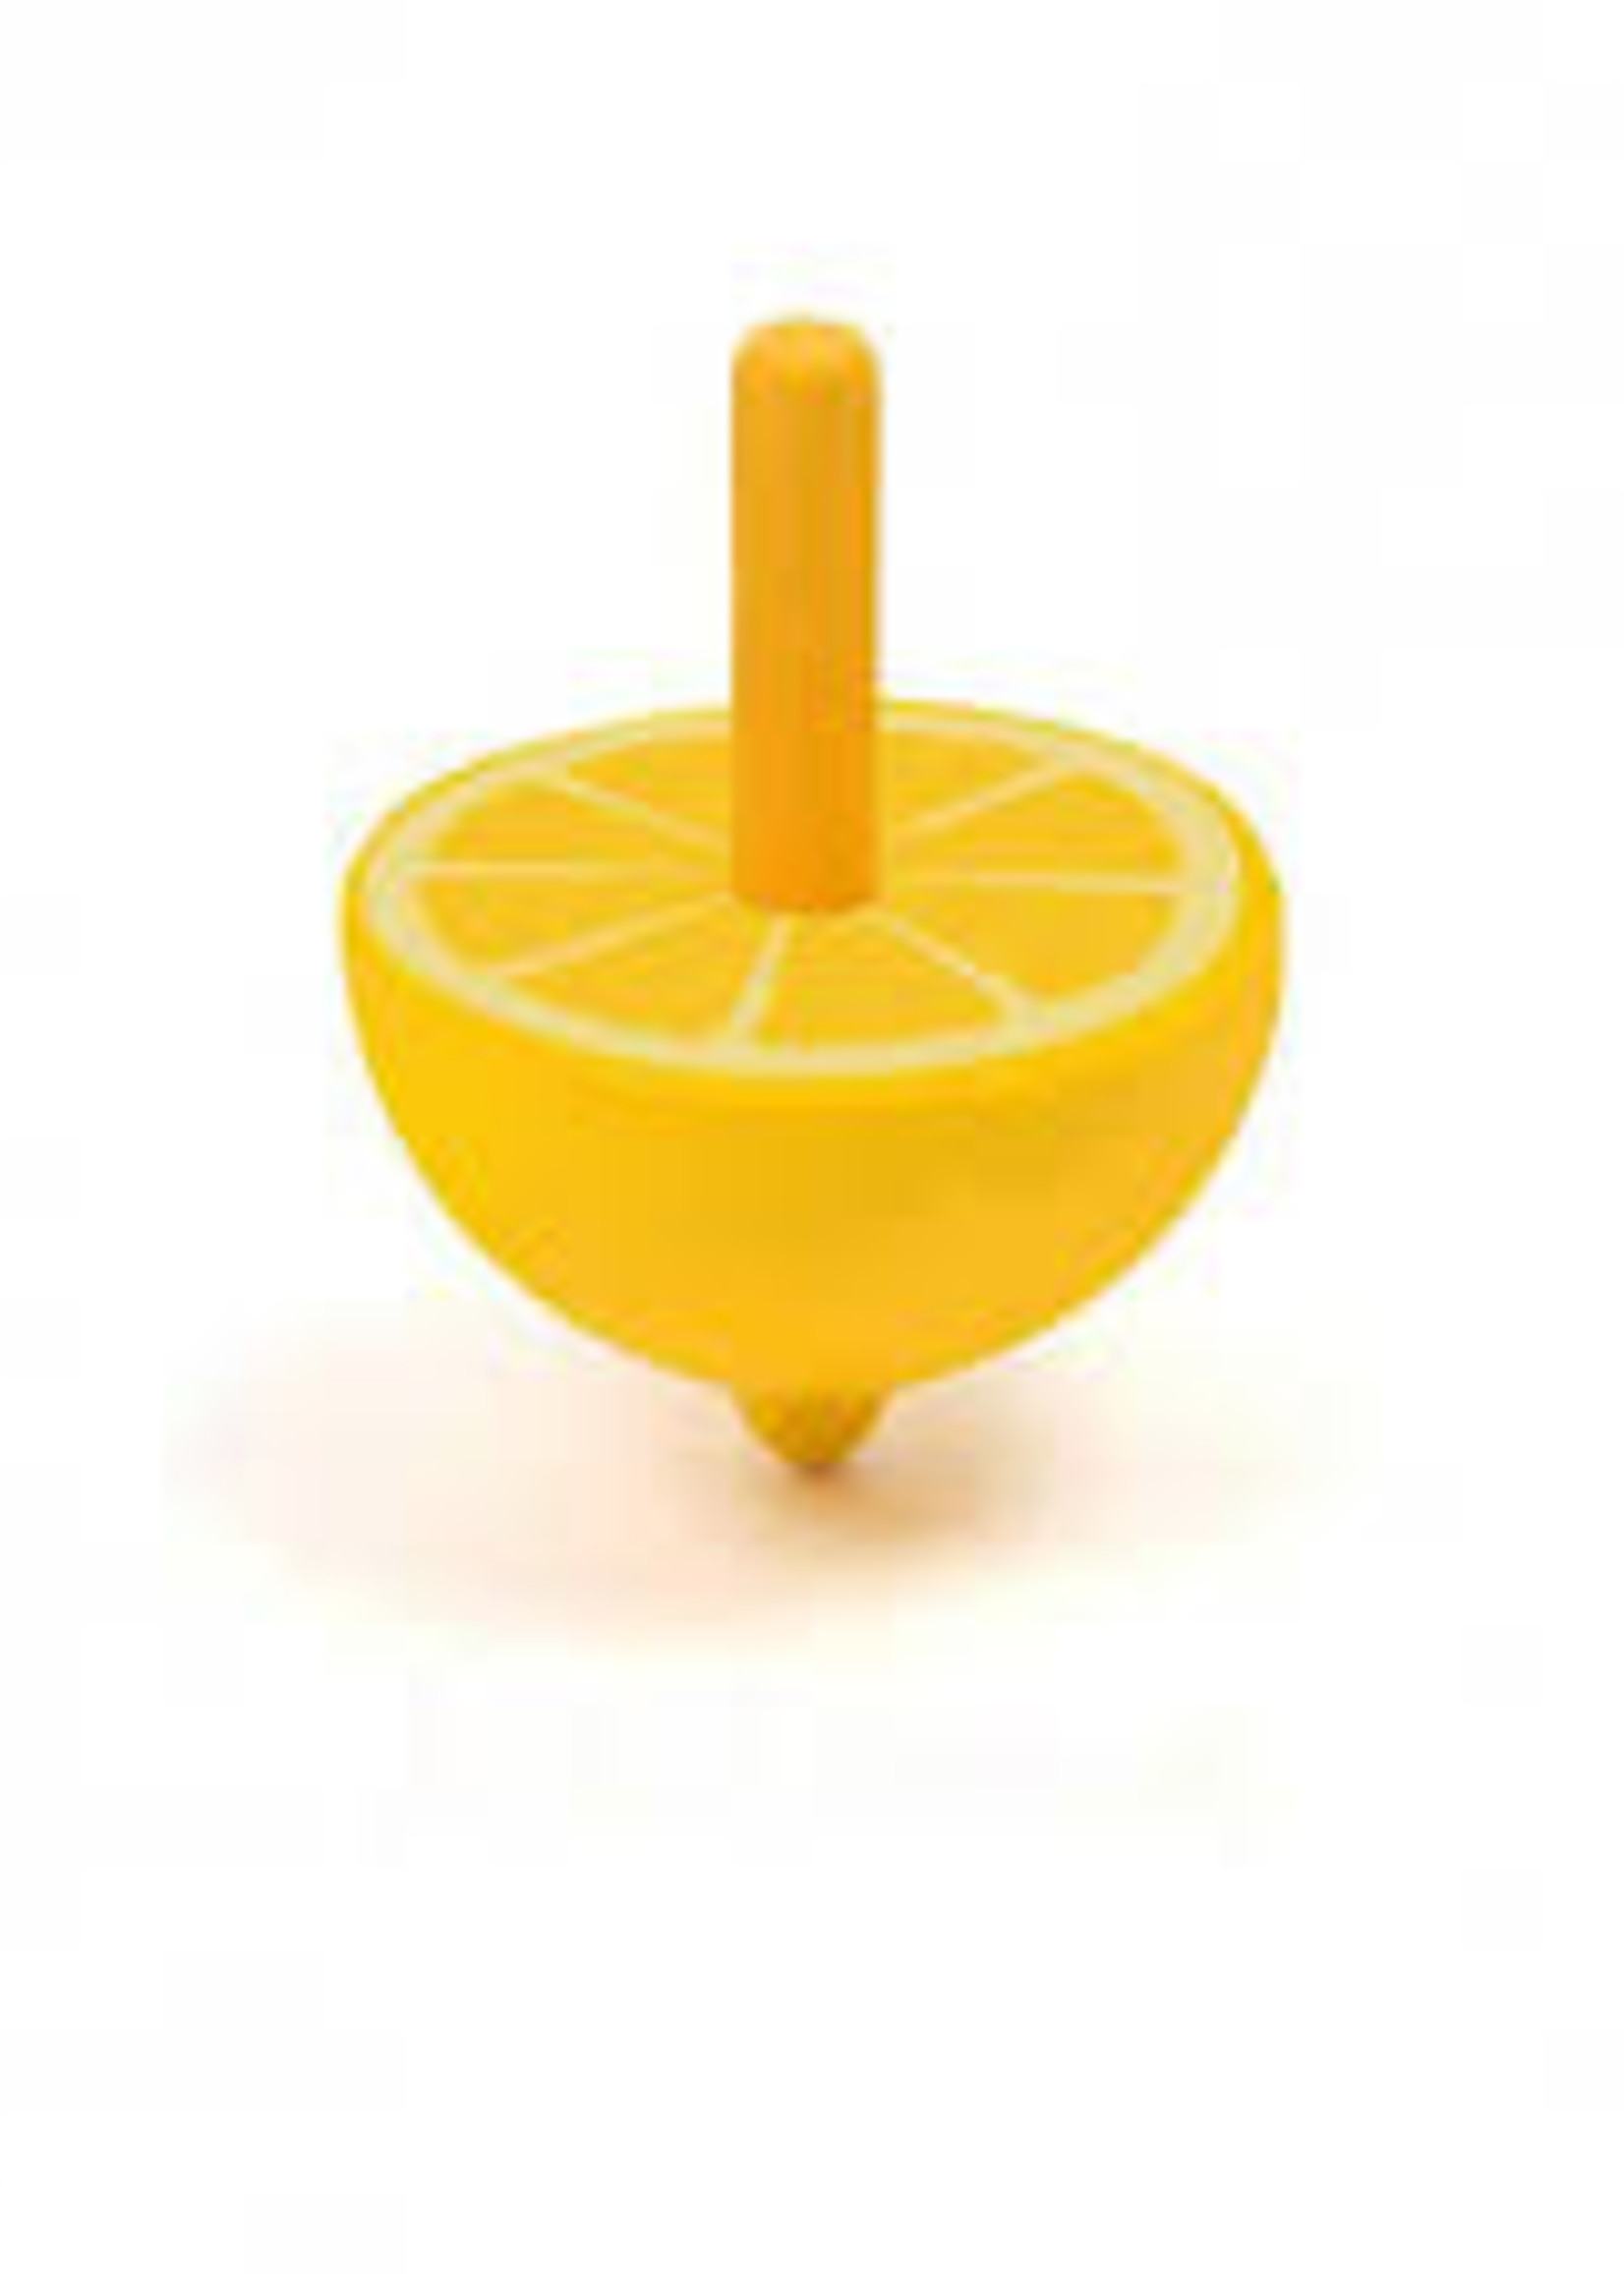 Mideer Mideer-AW20 MD2025 Mini Tops - Lemon